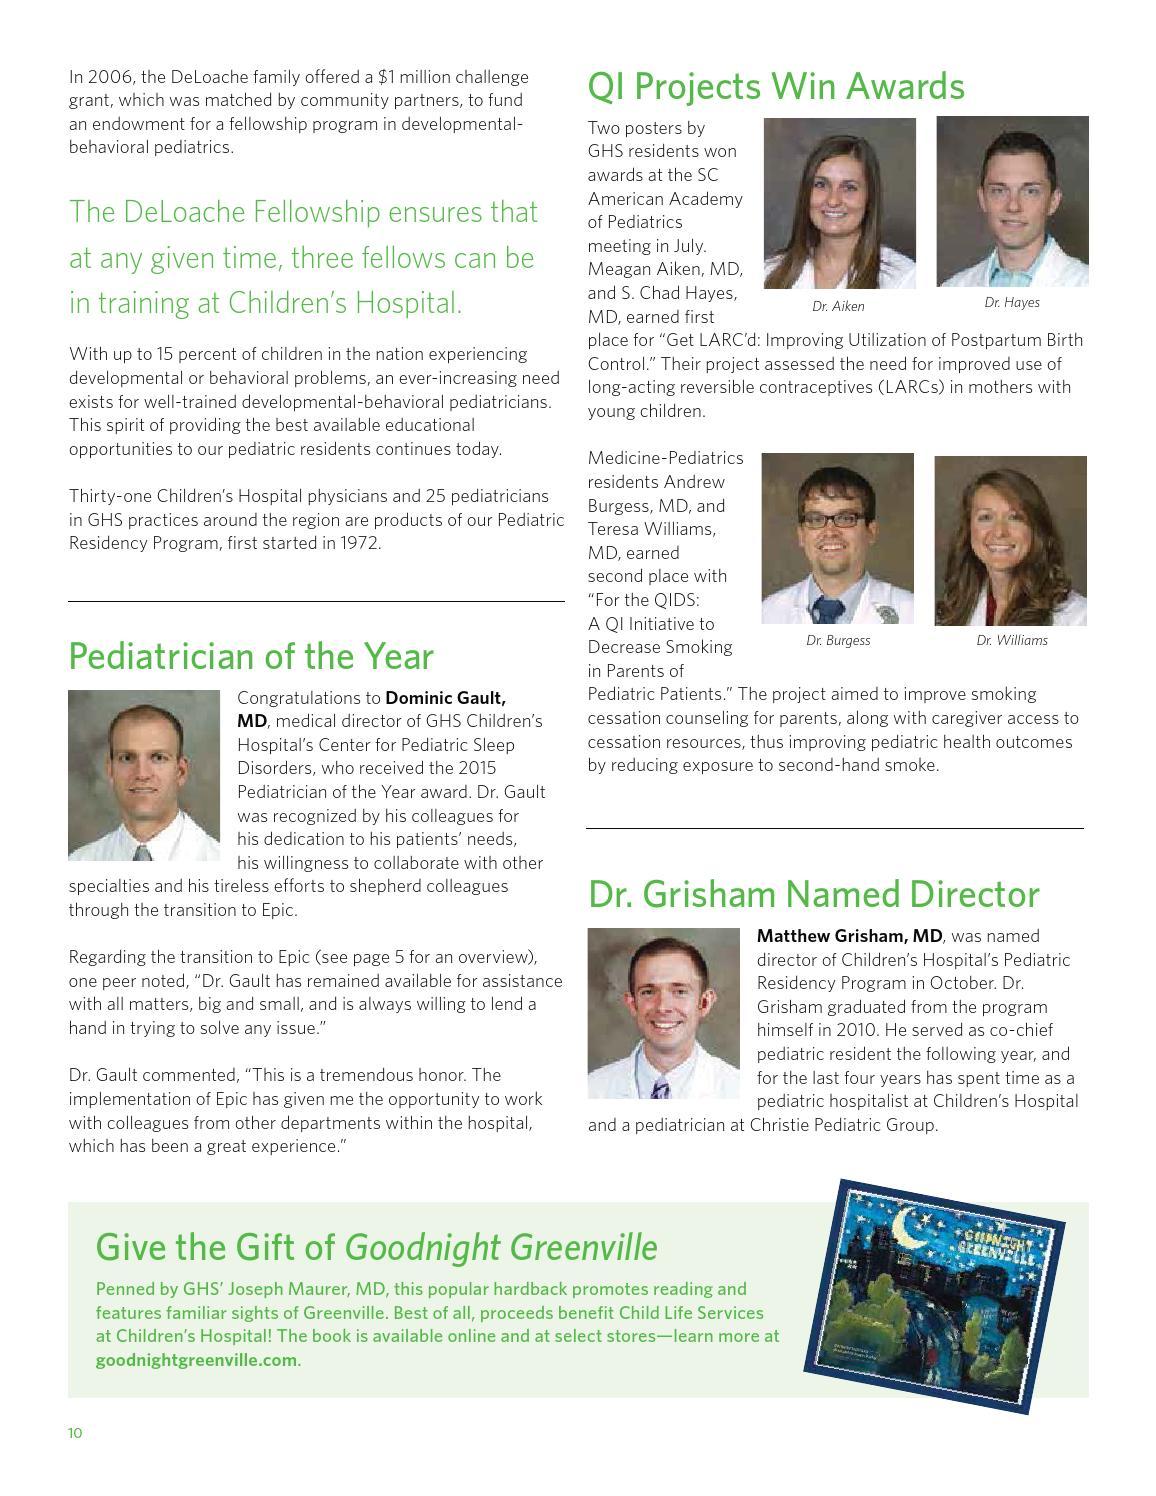 Greenville Health System Pediatric Focus fall 2015 fnl by